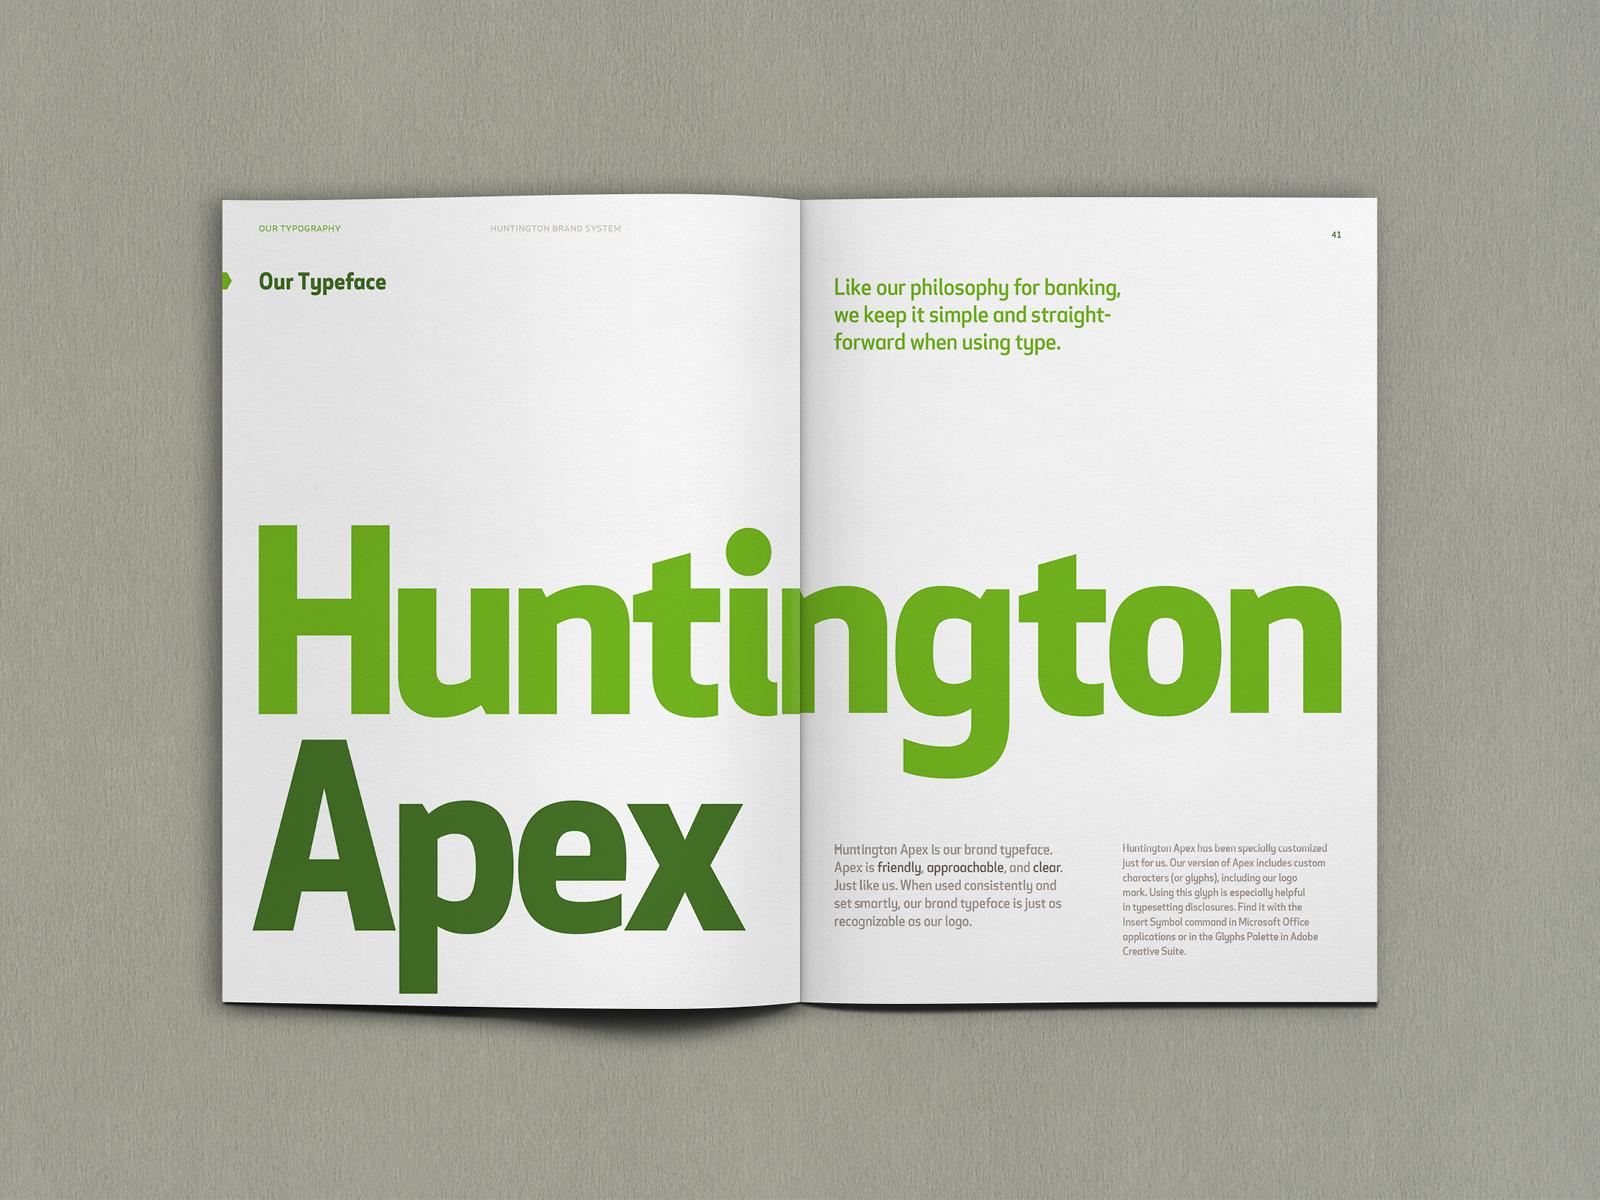 Huntington Bank brand guides